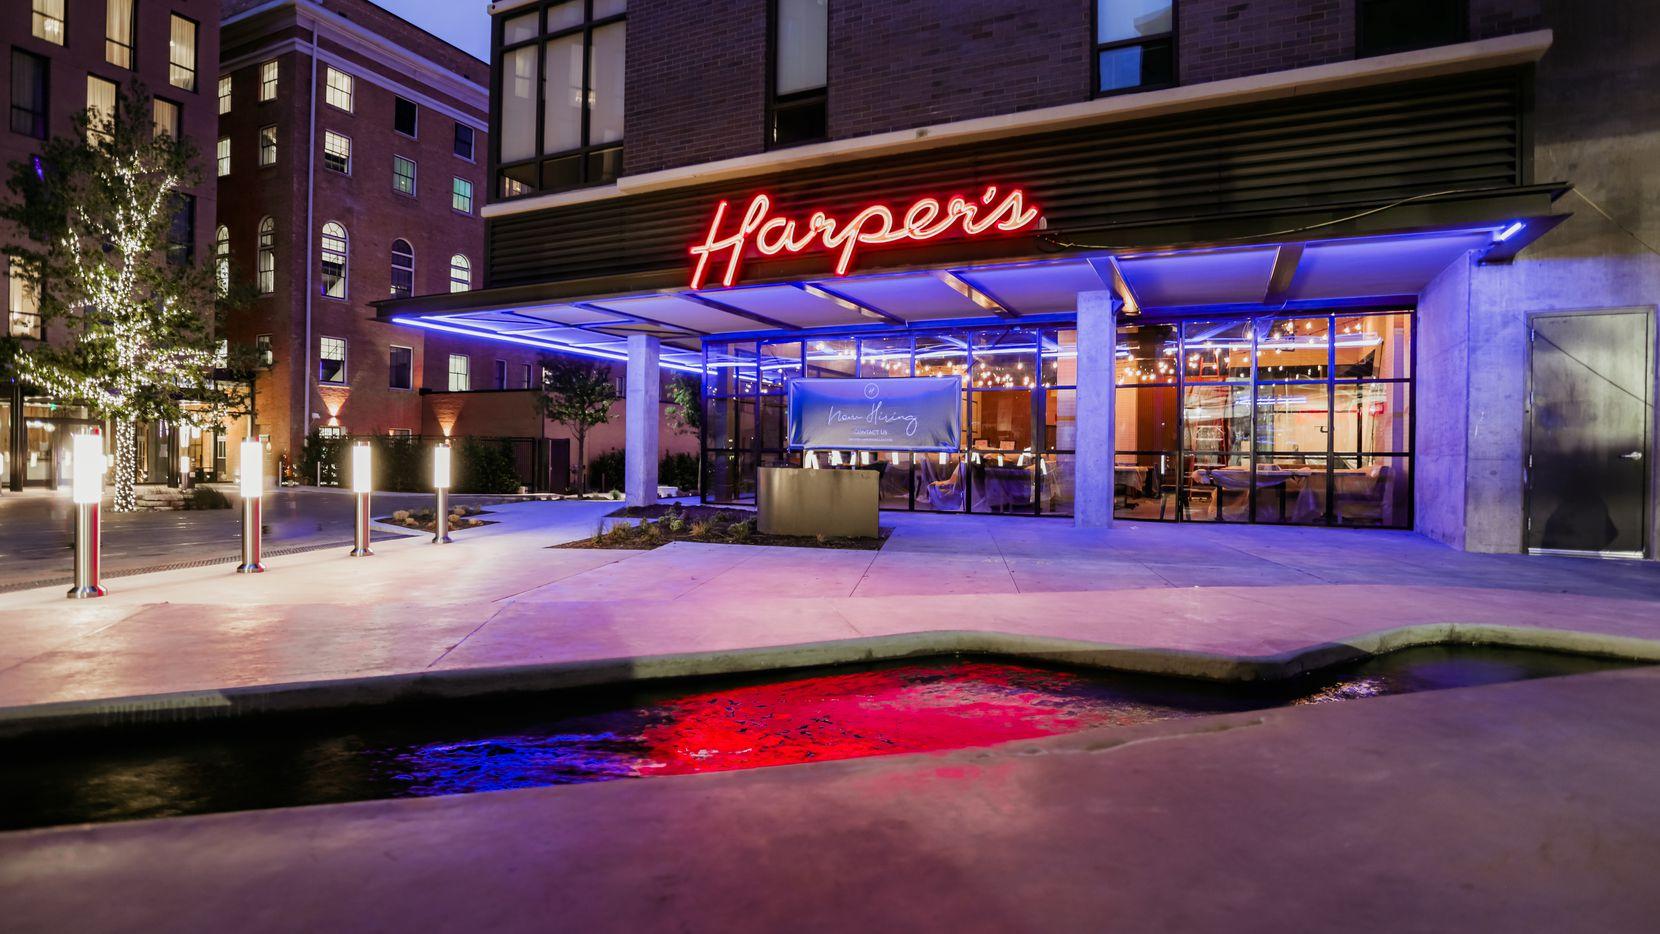 Harper's is a new restaurant in Deep Ellum, near Elm Street and Good-Latimer in Dallas.